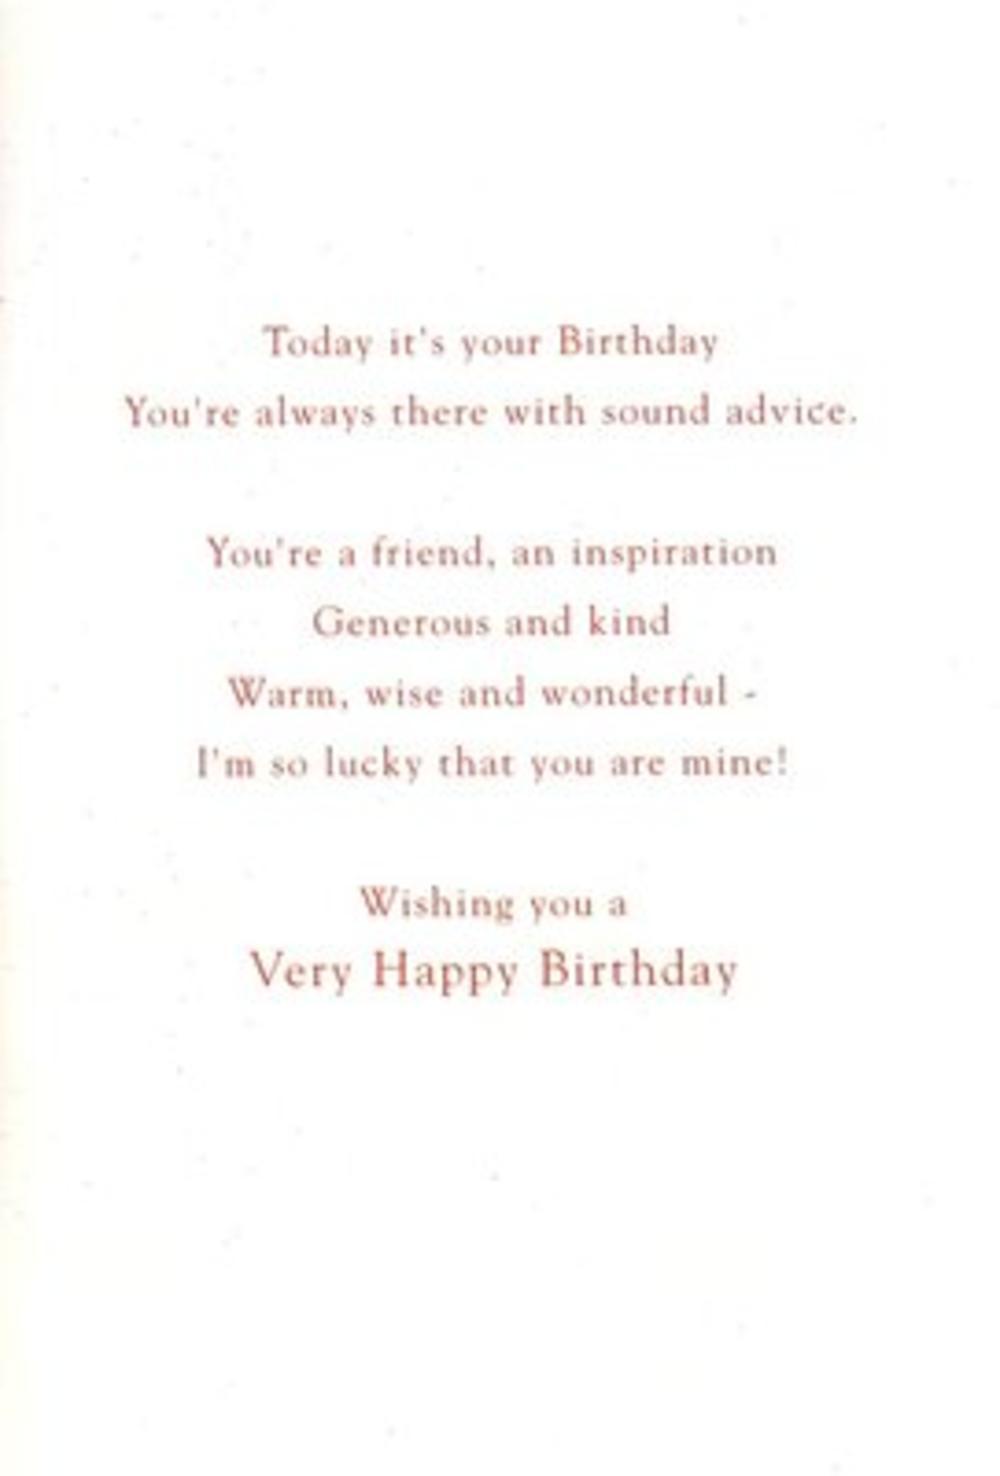 Grandad Birthday Poetry In Motion Card Cards Love Kates